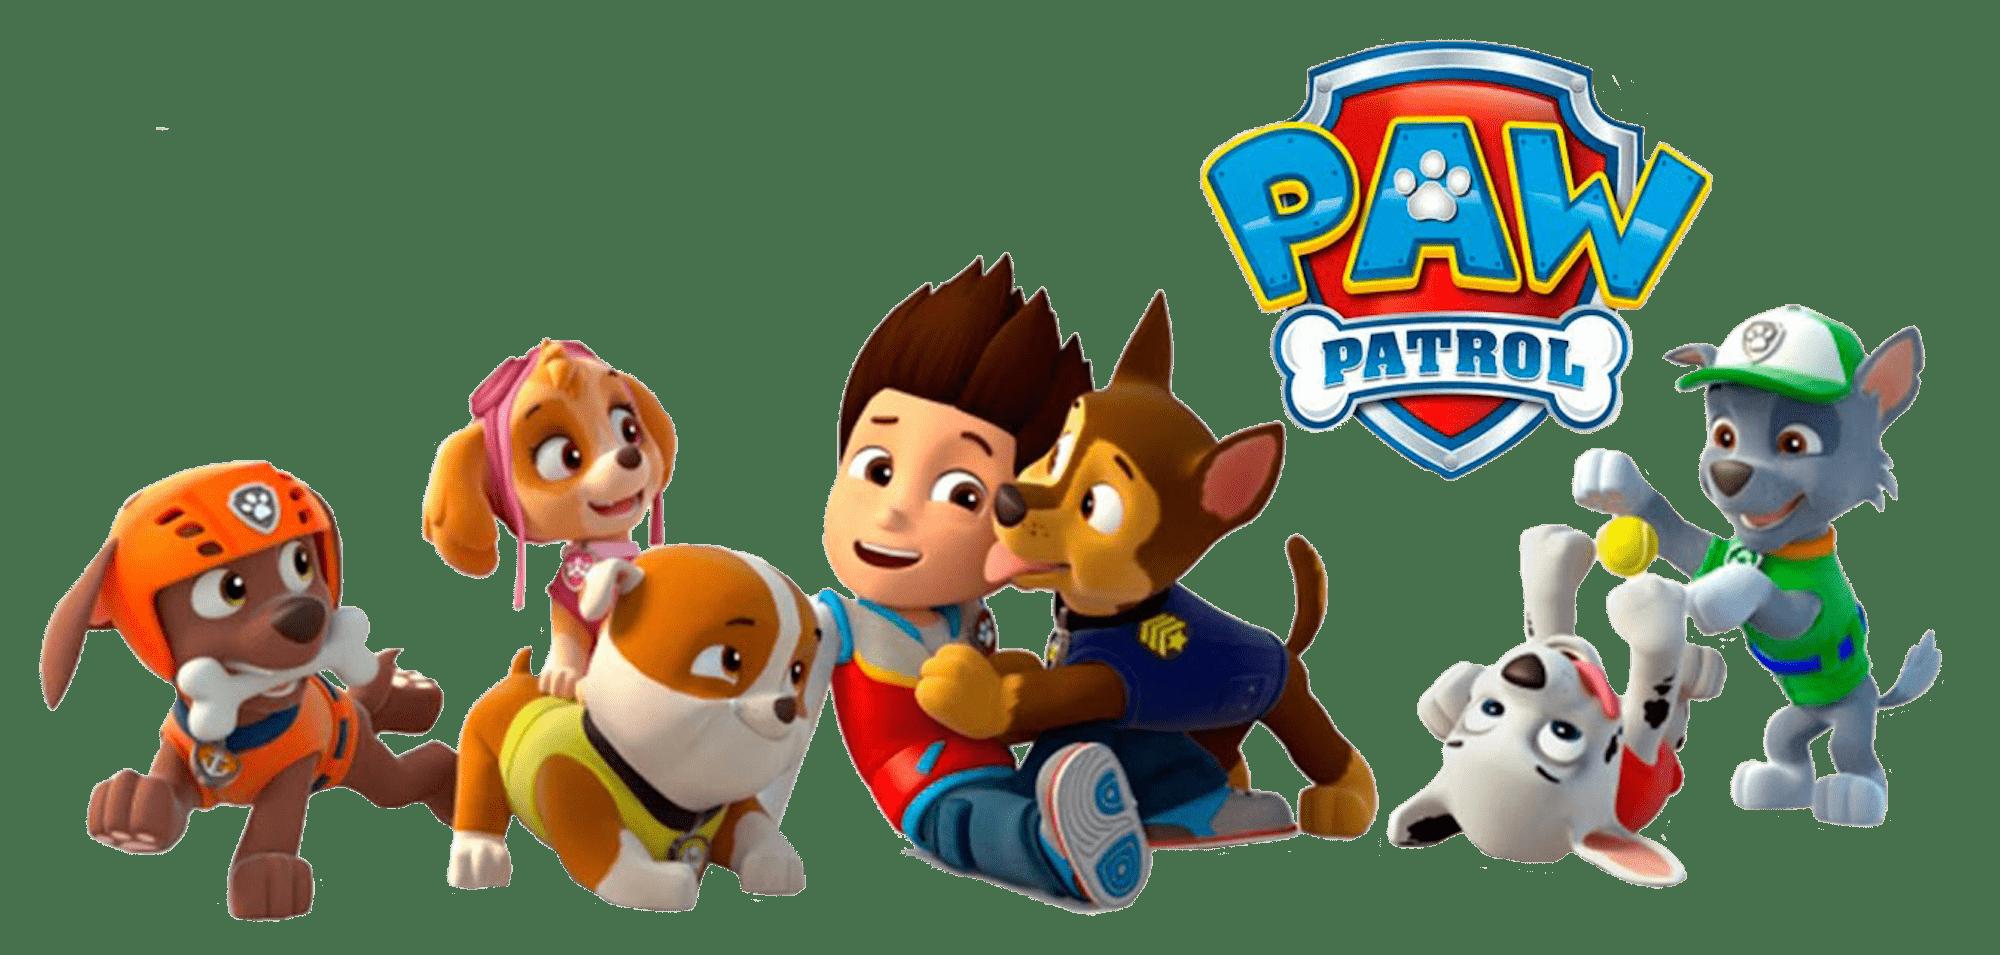 paw patrol vector at getdrawings  free download